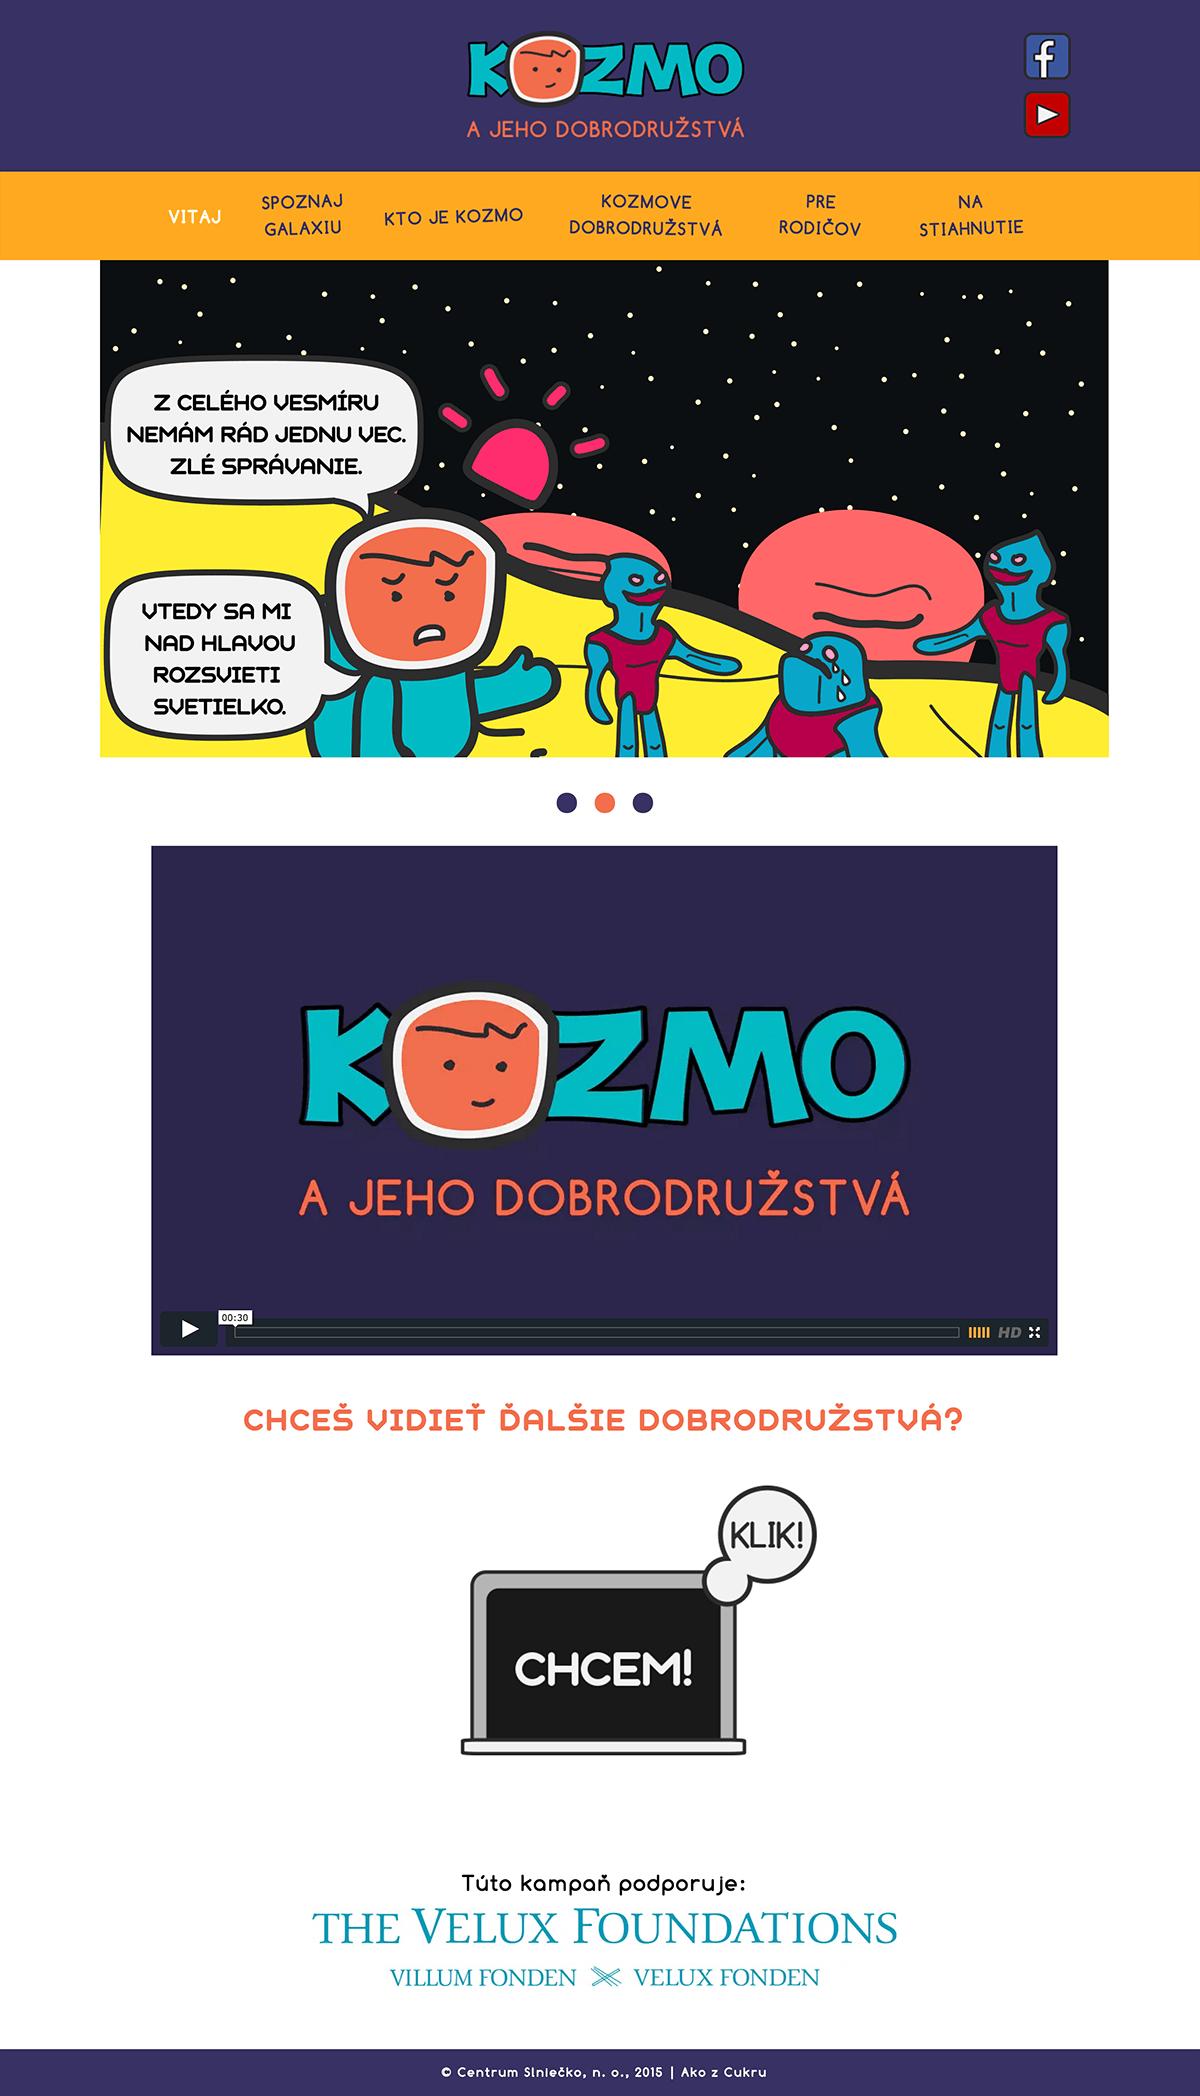 Kozmo